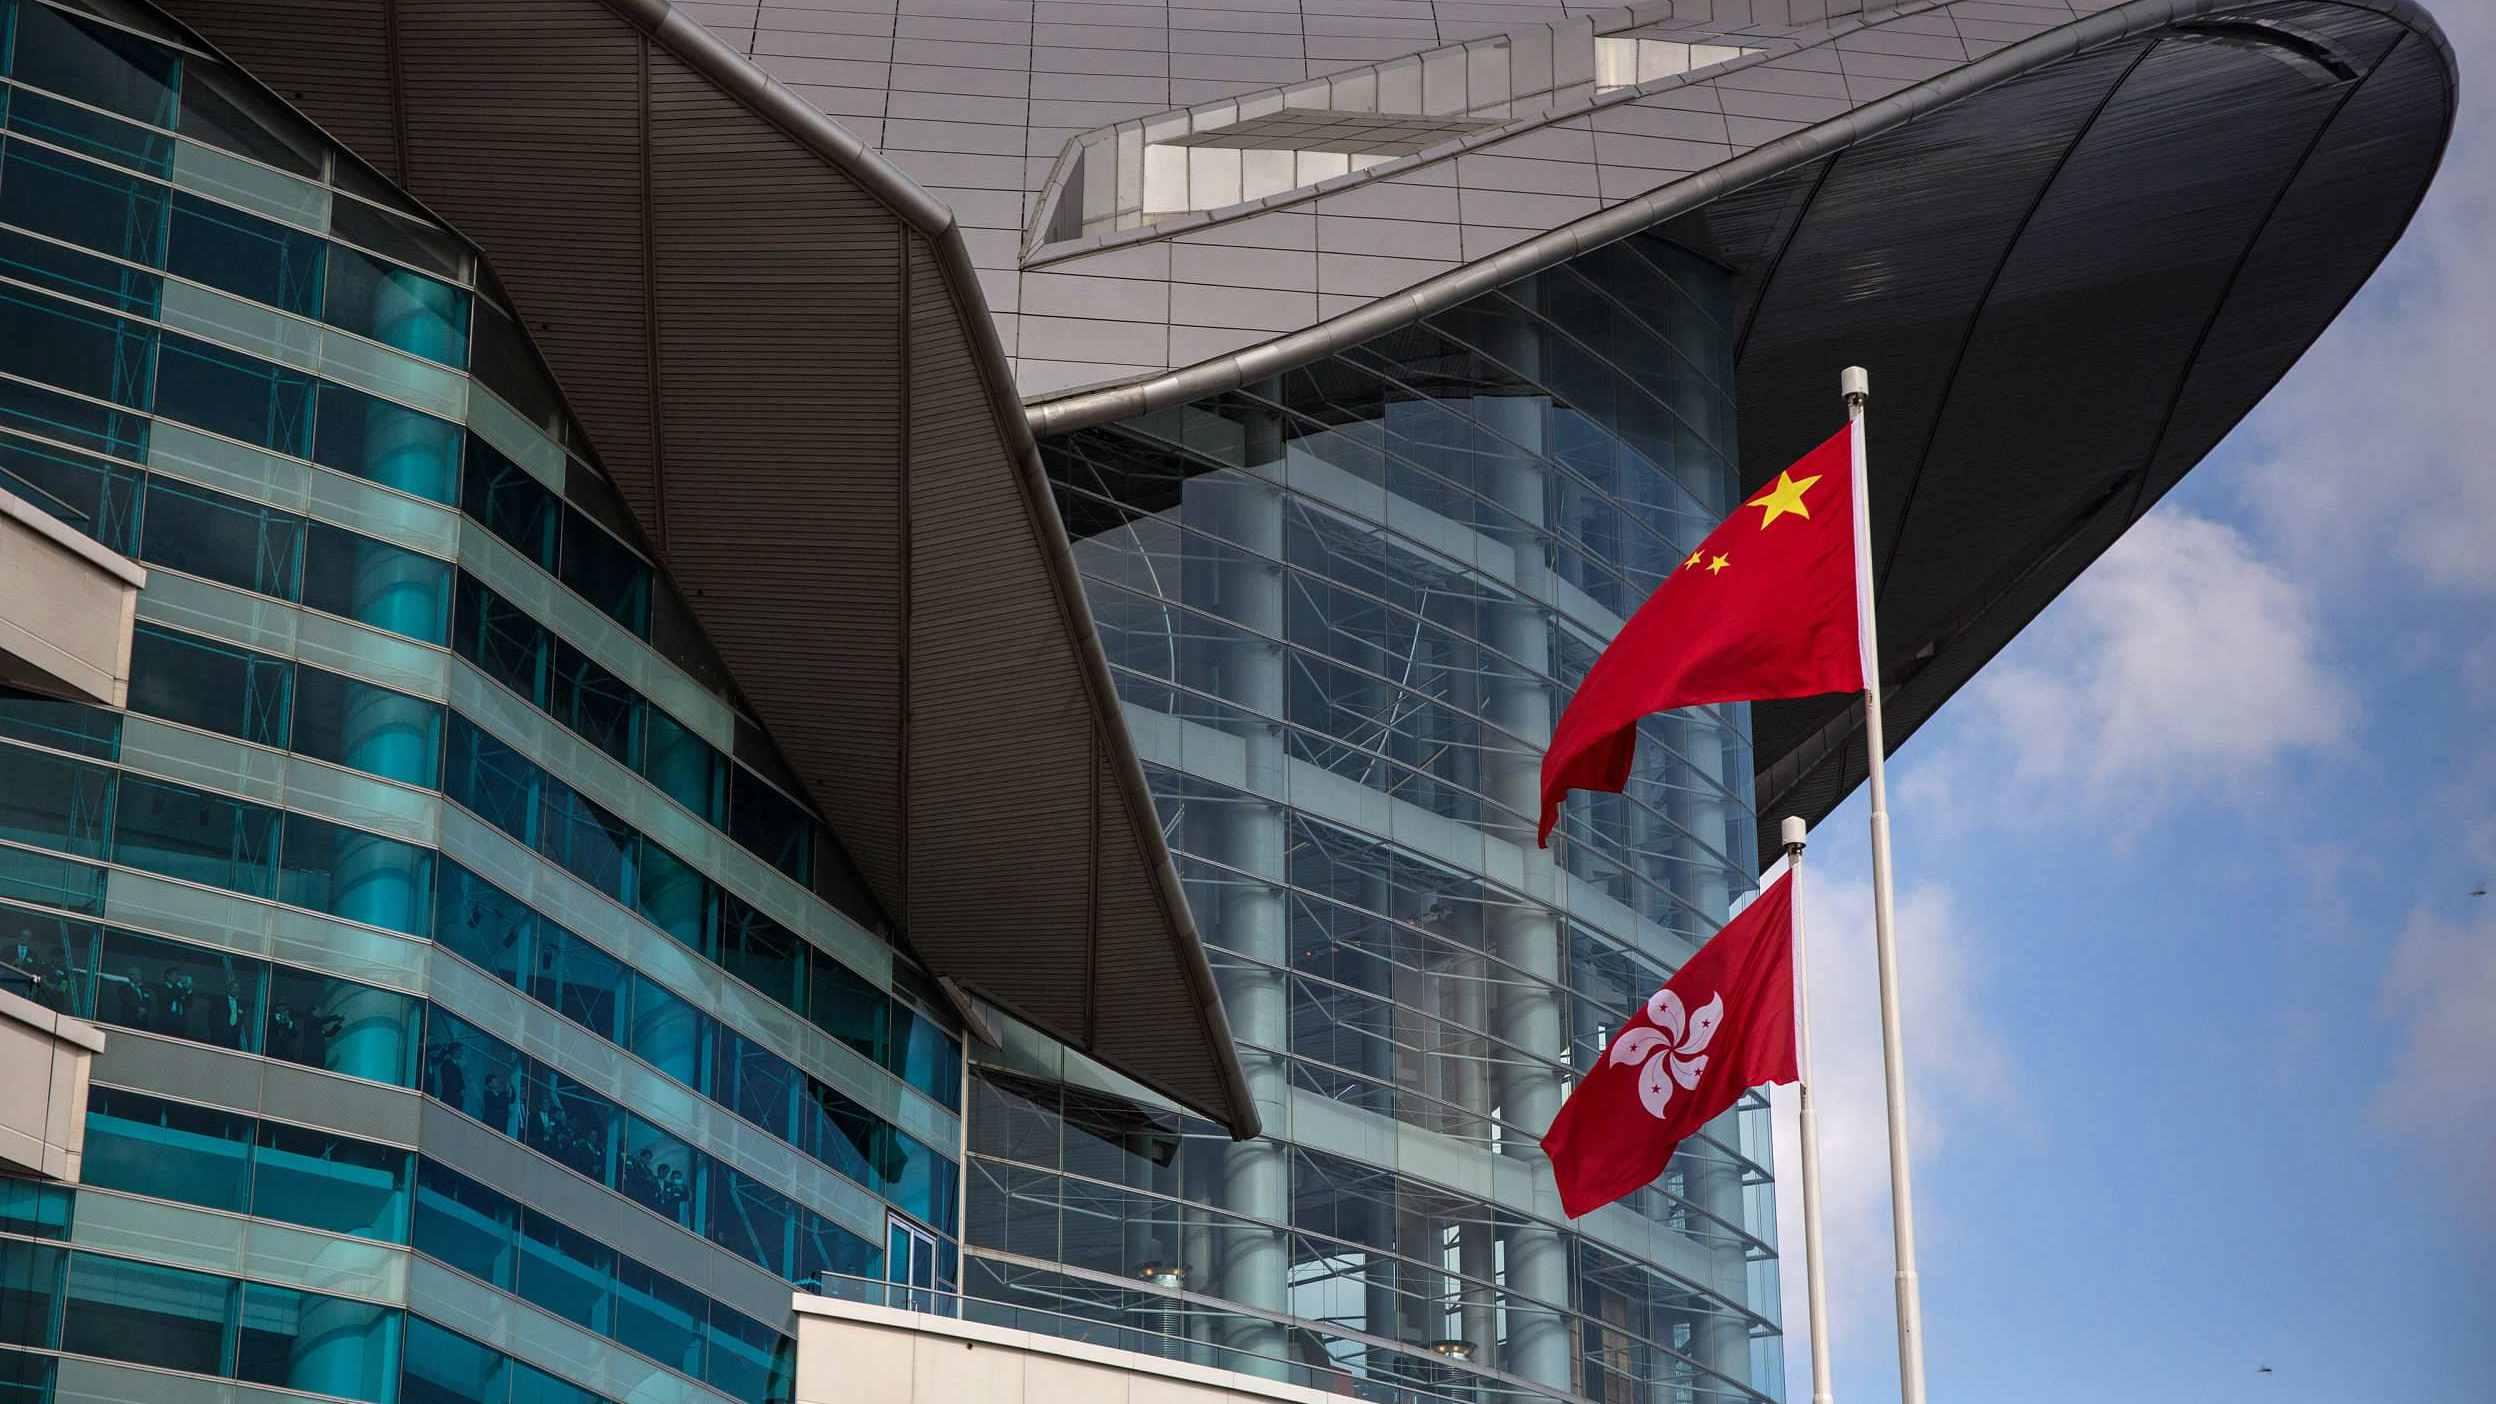 China's top legislature adopts decision for 6th HKSAR LegCo to continue performing duties